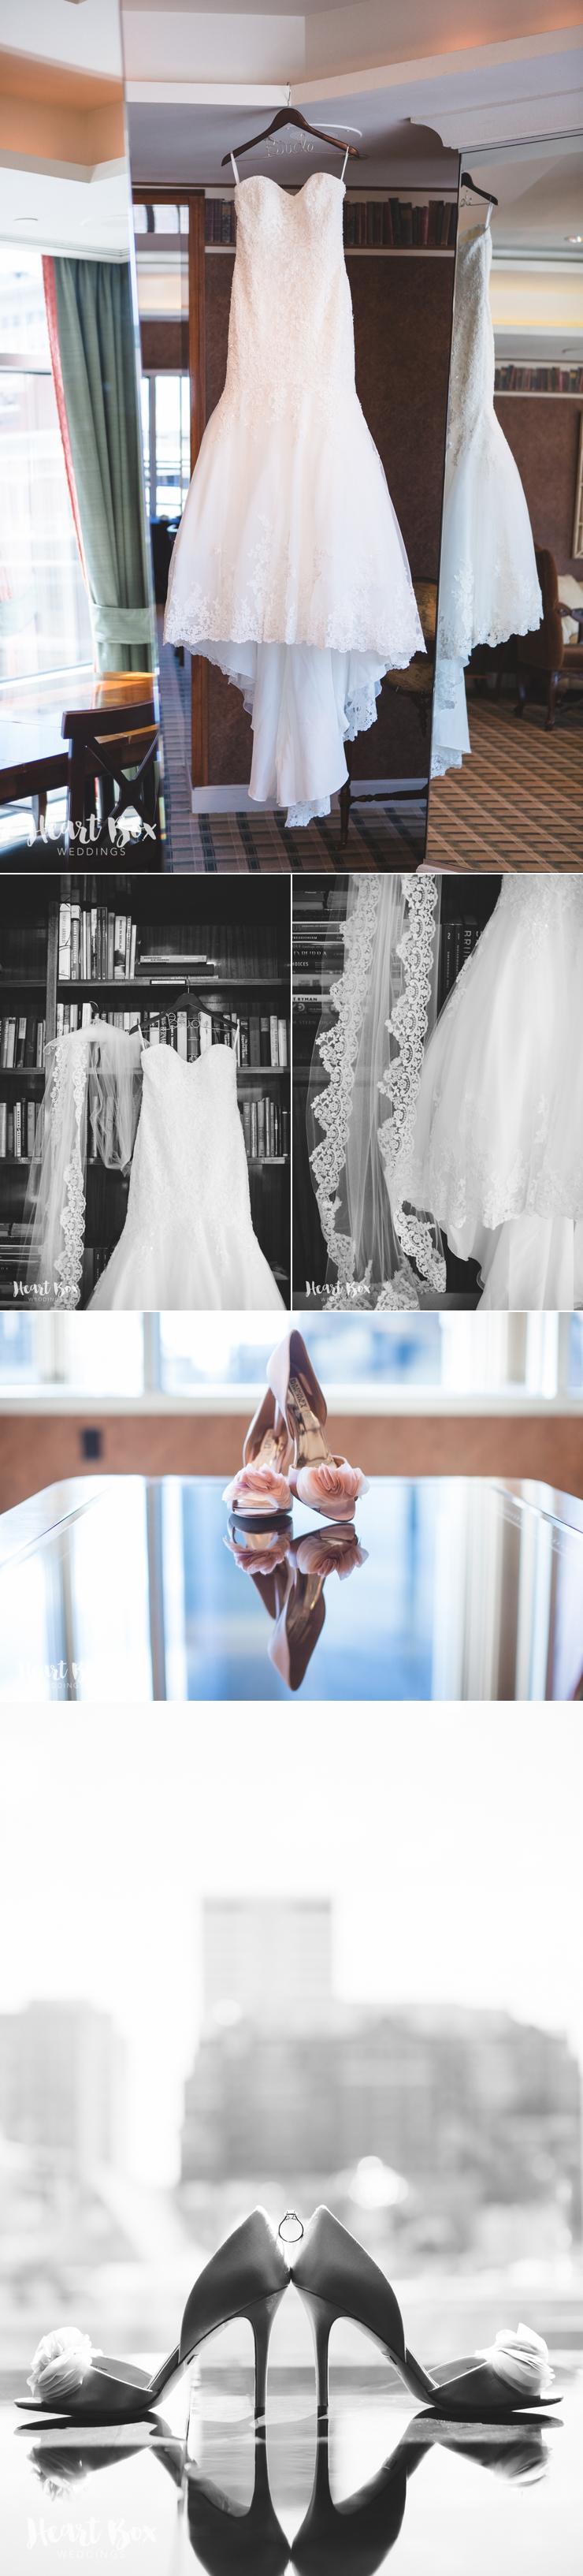 Smith Wedding Blog Collages 2.jpg